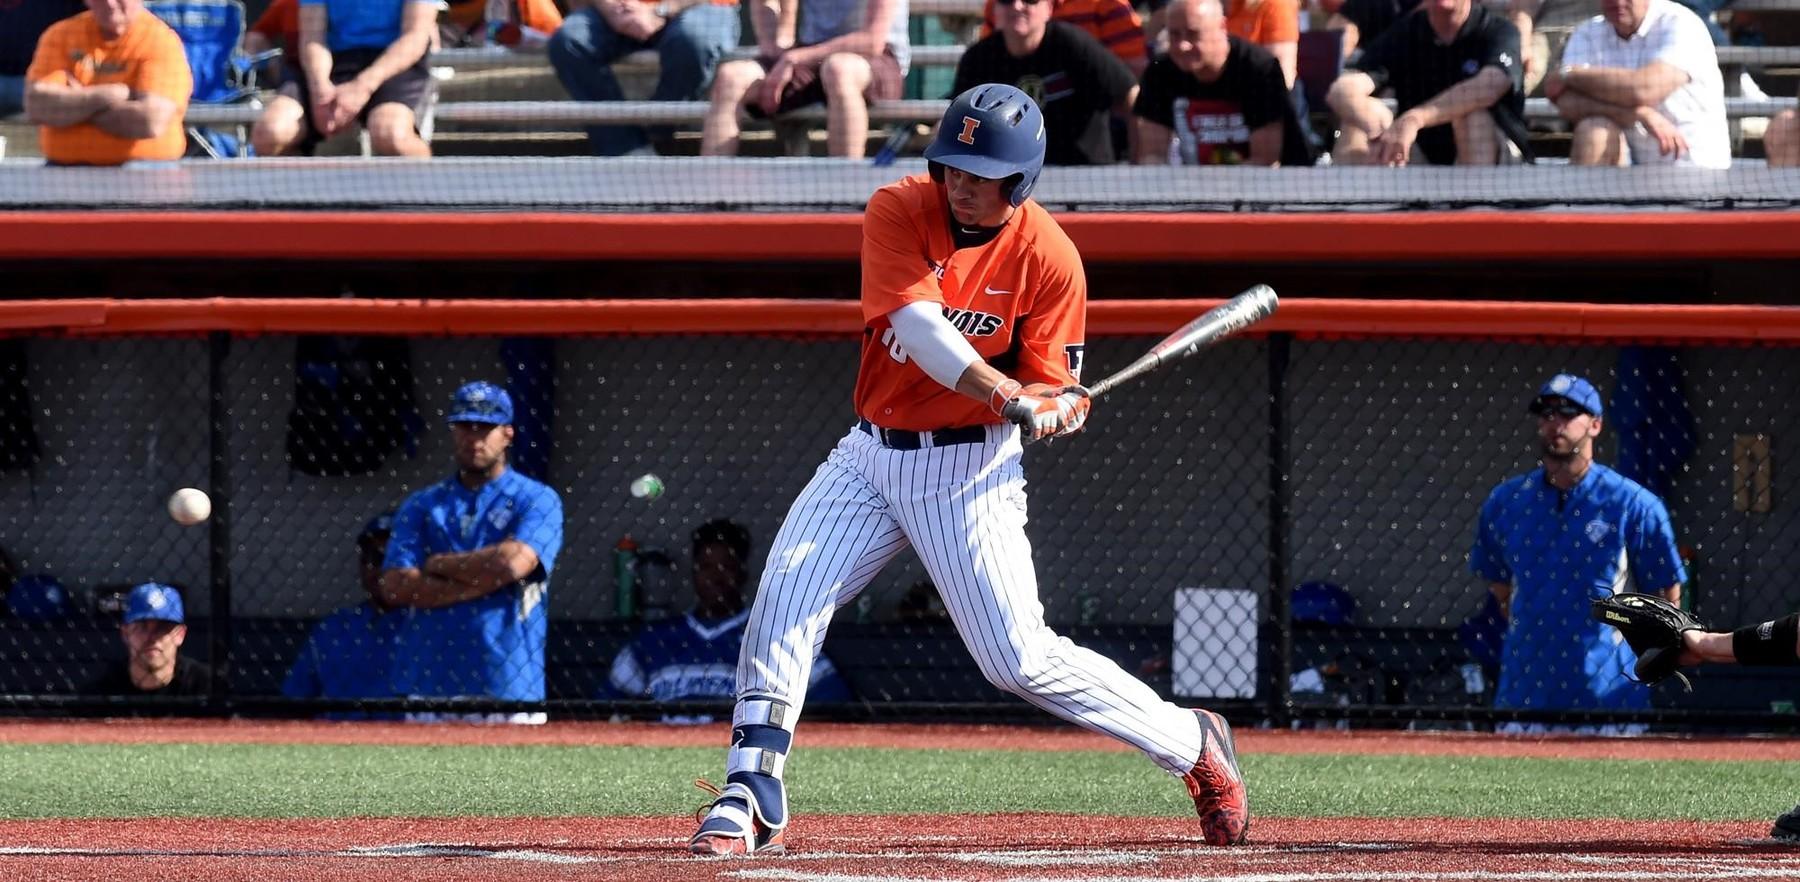 image of Illini baseball player at bat, swinging